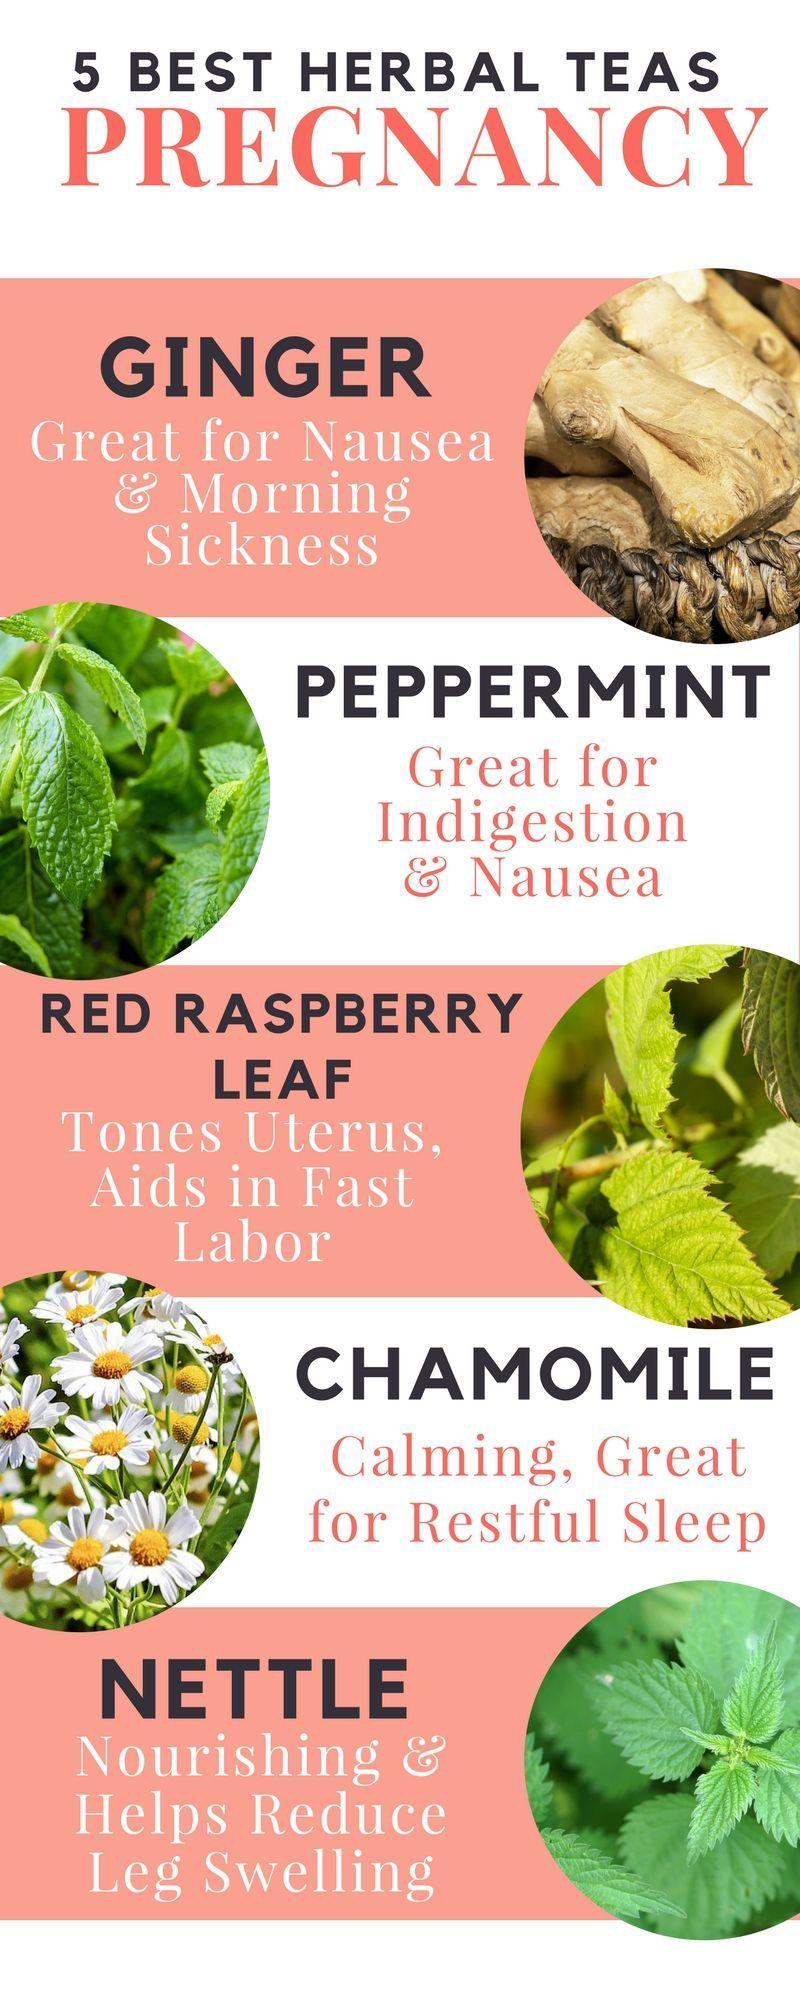 5 of the best herbal teas for pregnancy | ::: pregnancy